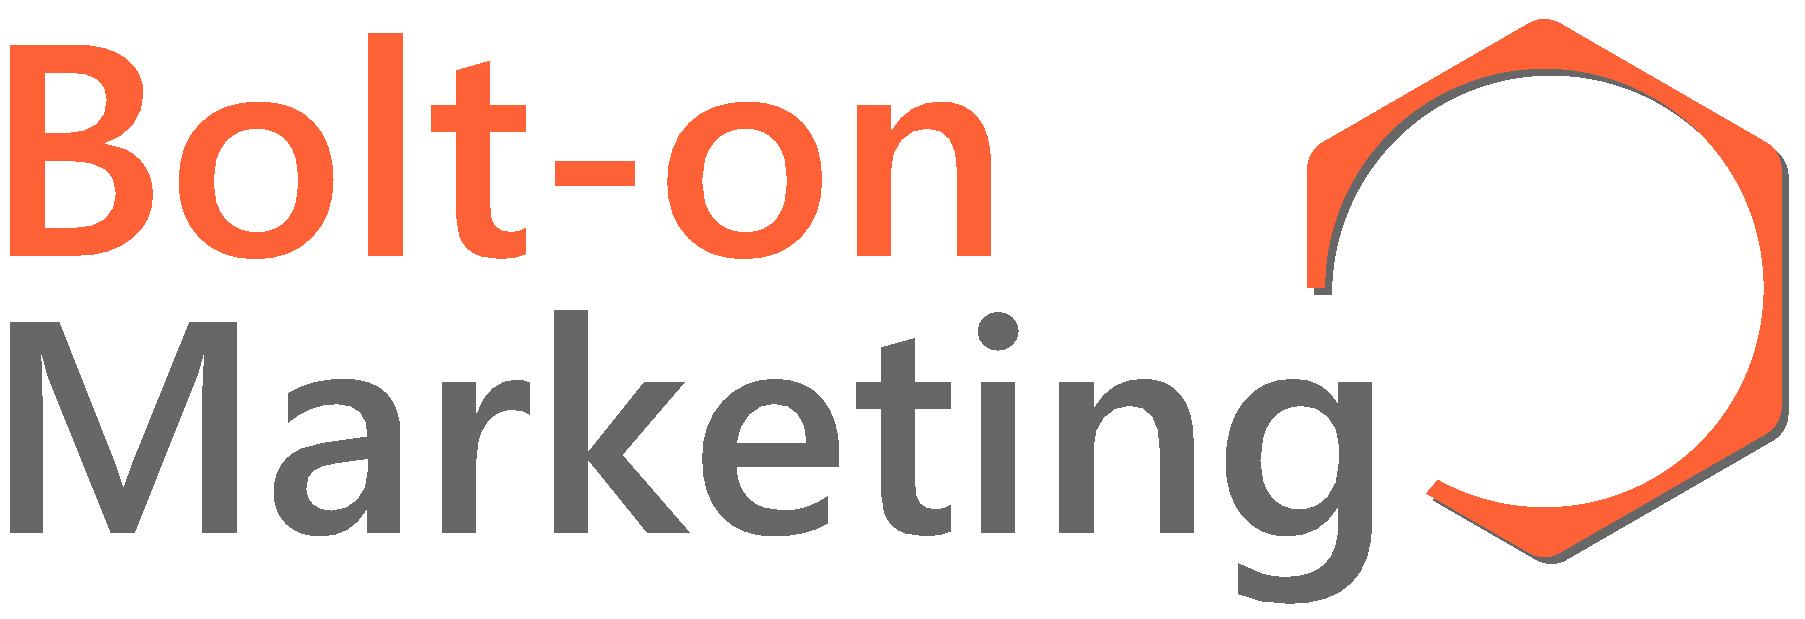 Bolt-on Marketing